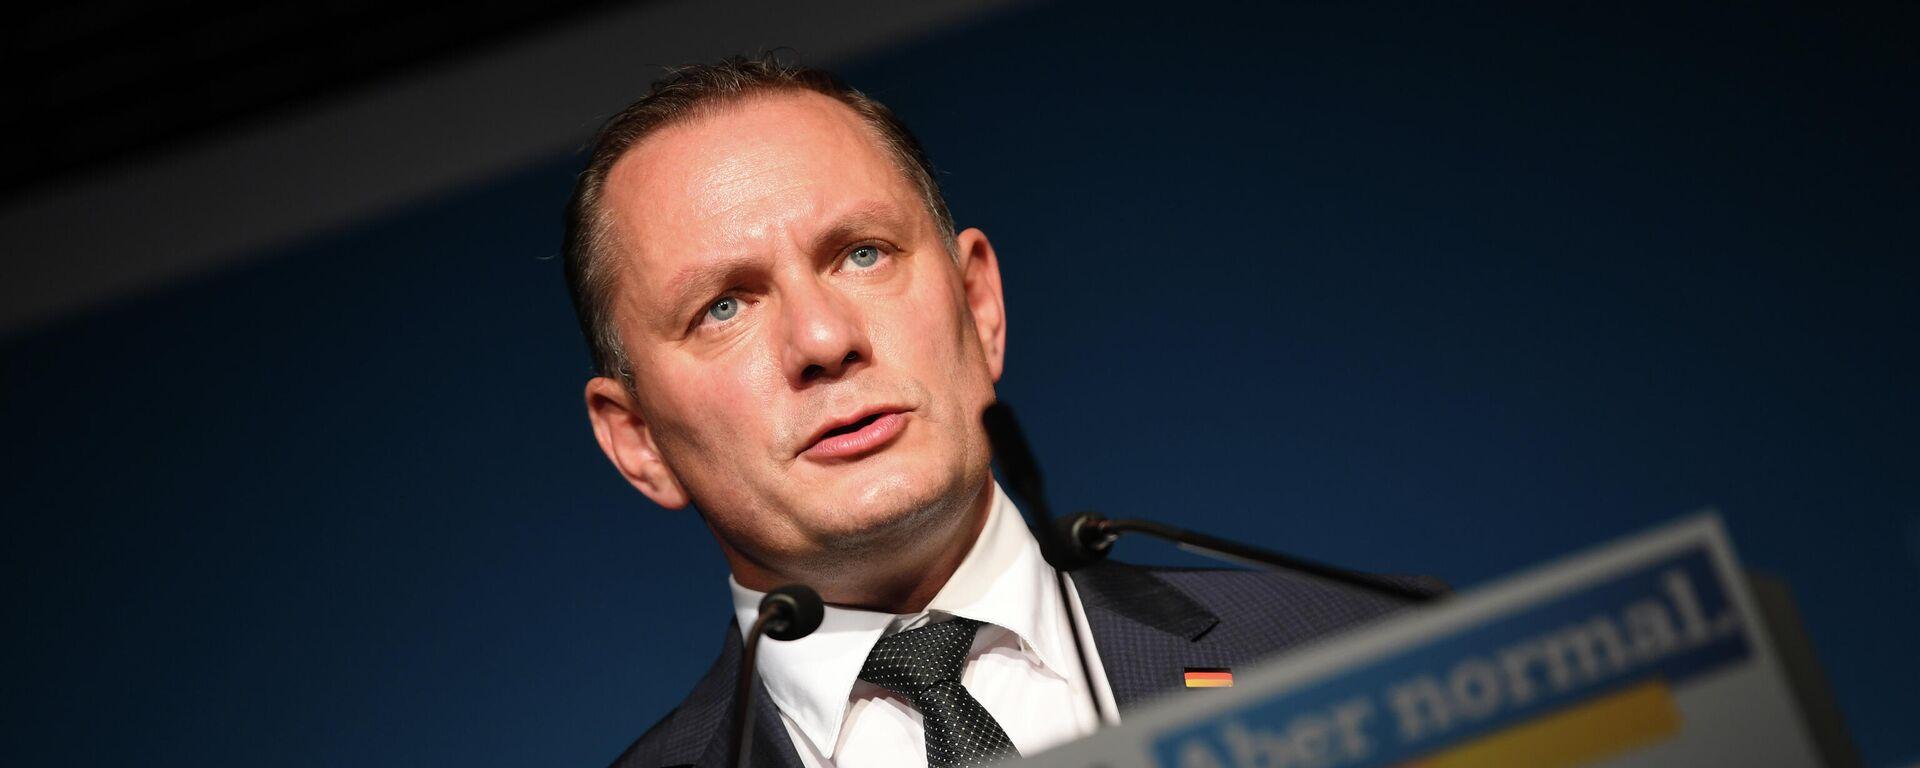 Der AfD-Co-Vorsitzende Tino Chrupalla am 26. September 2021 - SNA, 1920, 27.09.2021